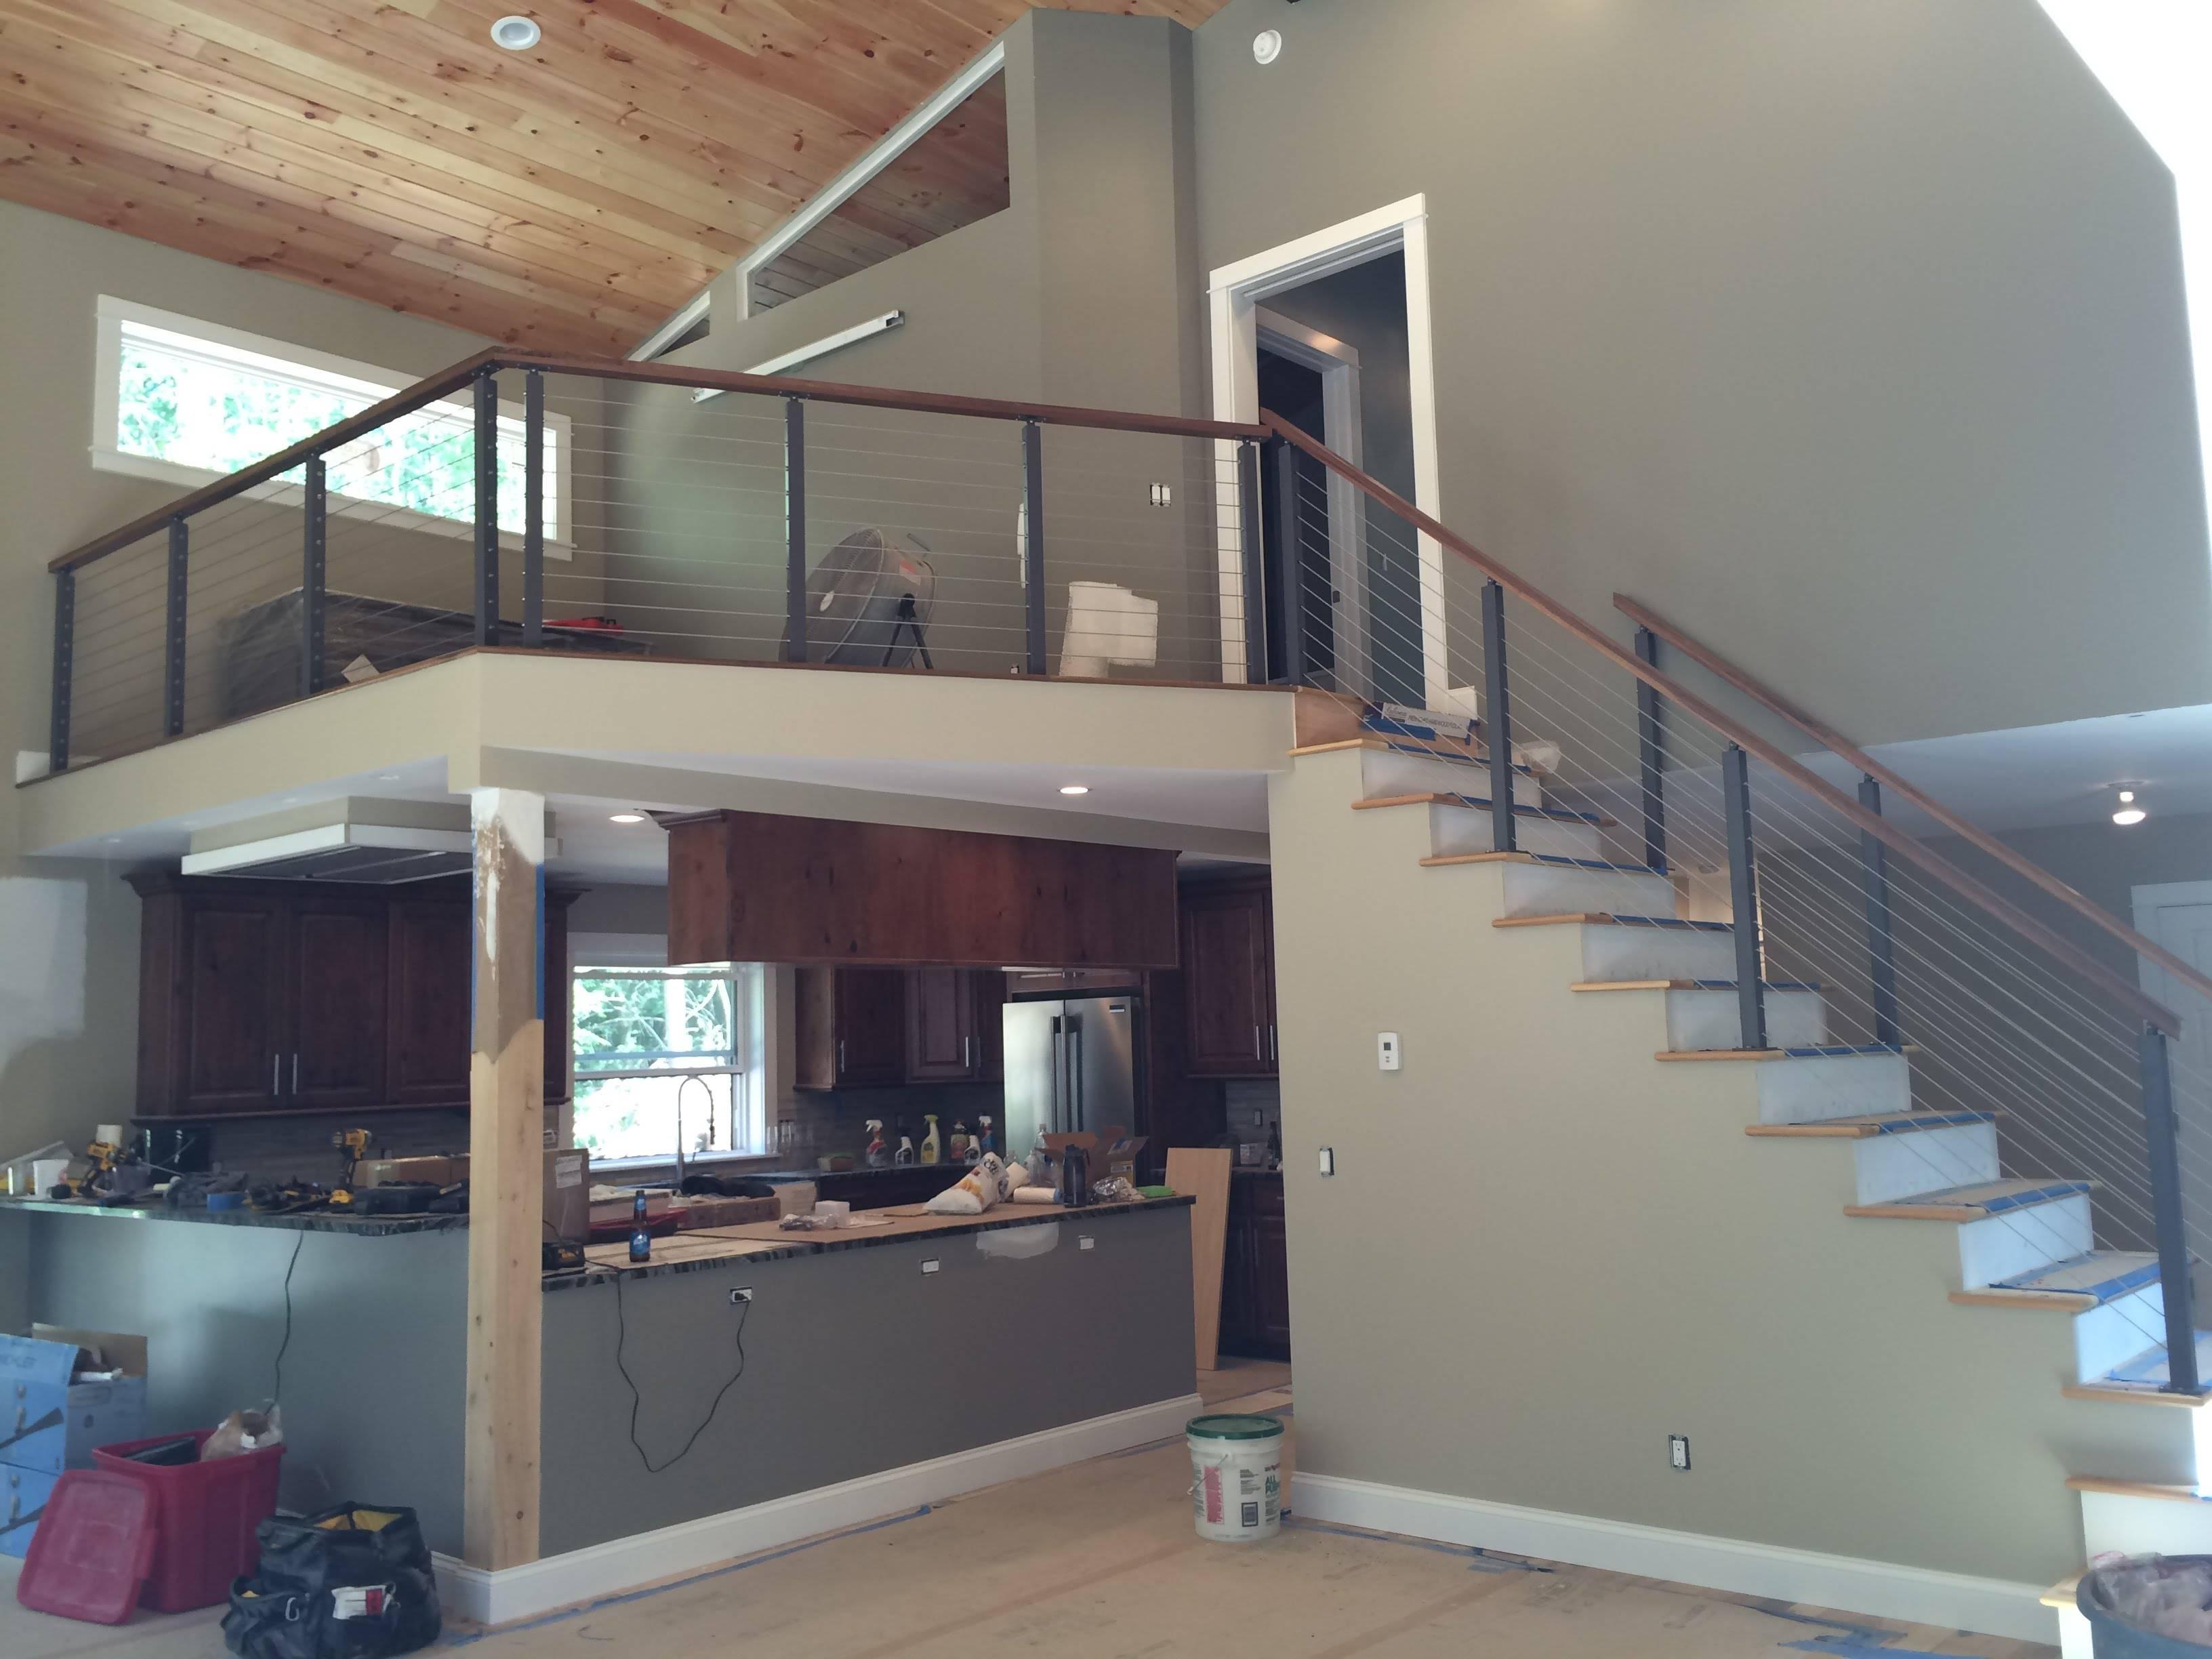 Jeremy Bouchard's railings